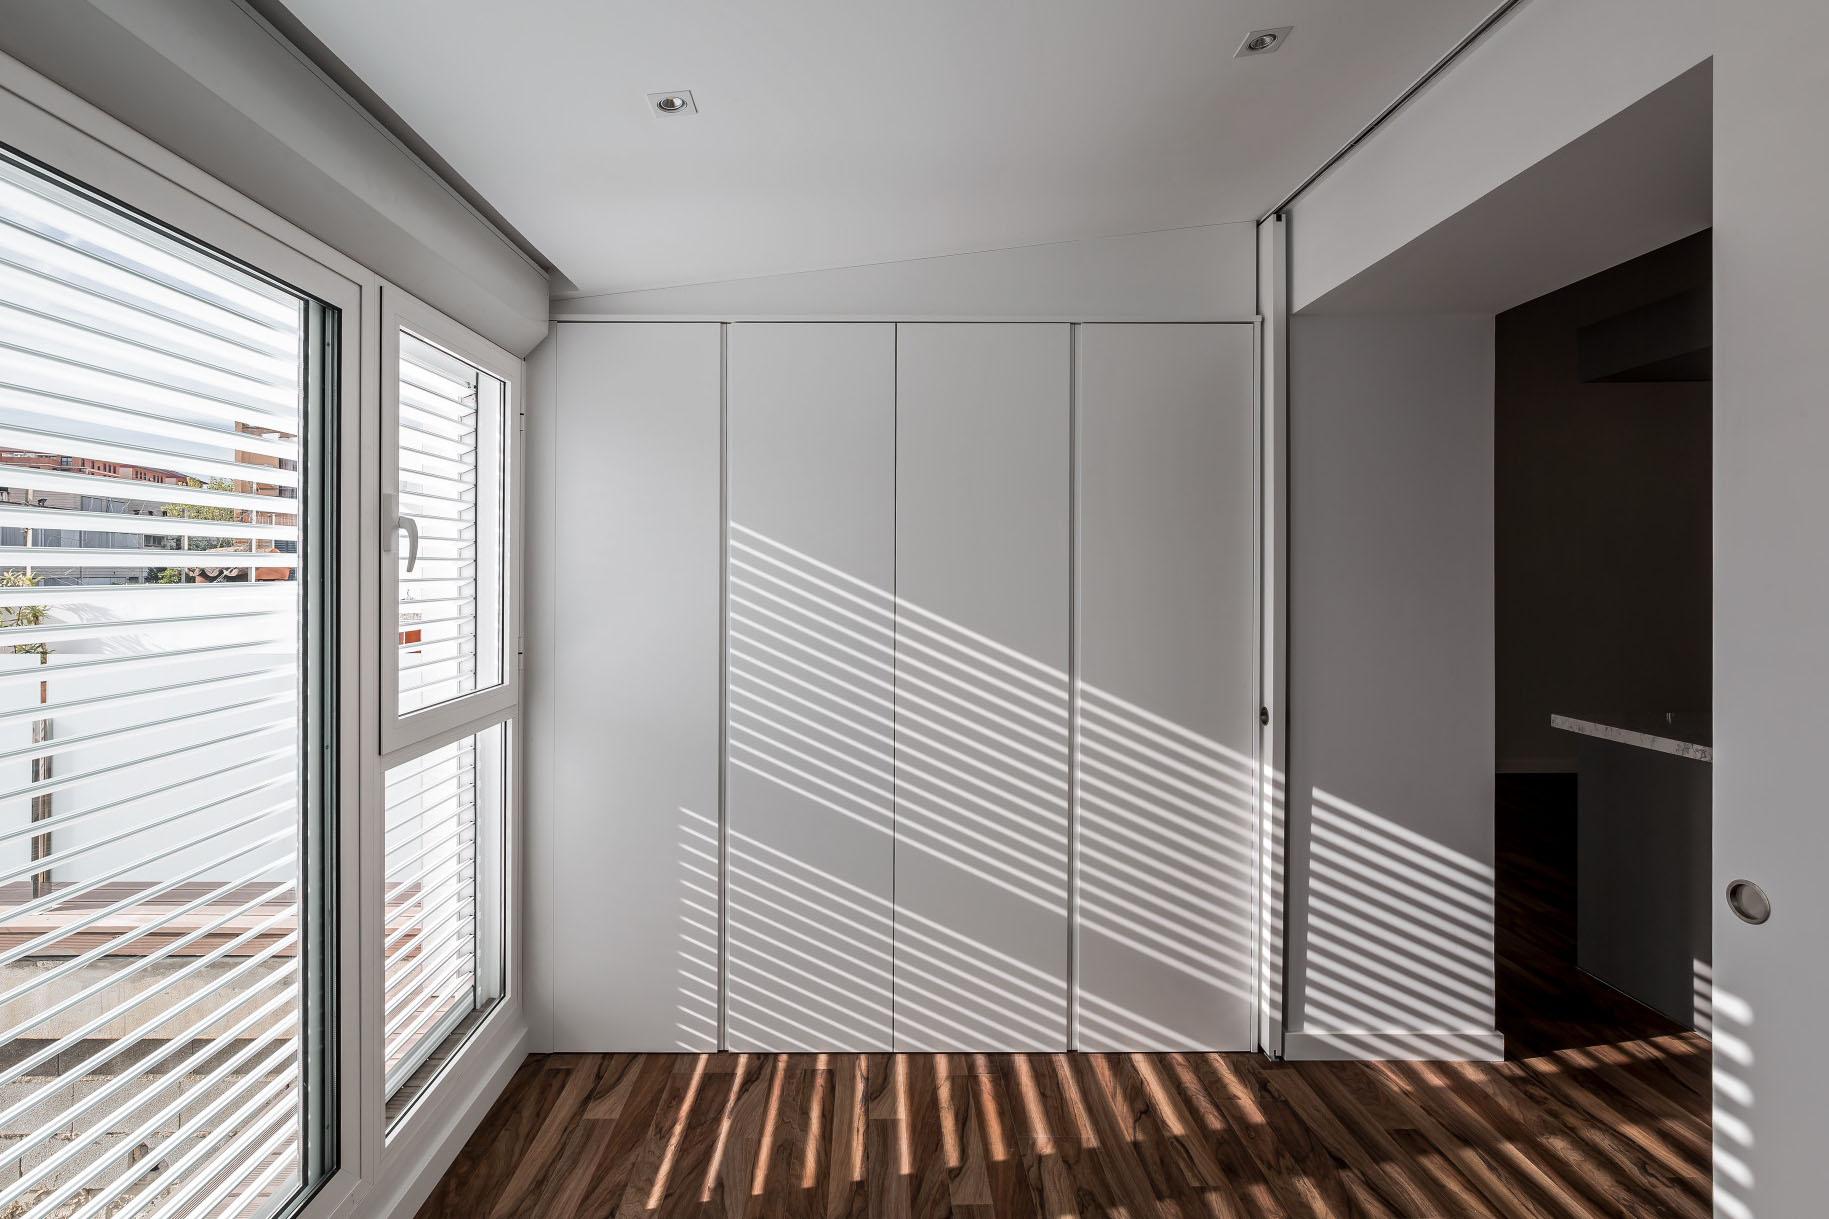 fotografia-arquitectura-valencia-german-cabo-viraje-reforma-campanar (x)_portada2